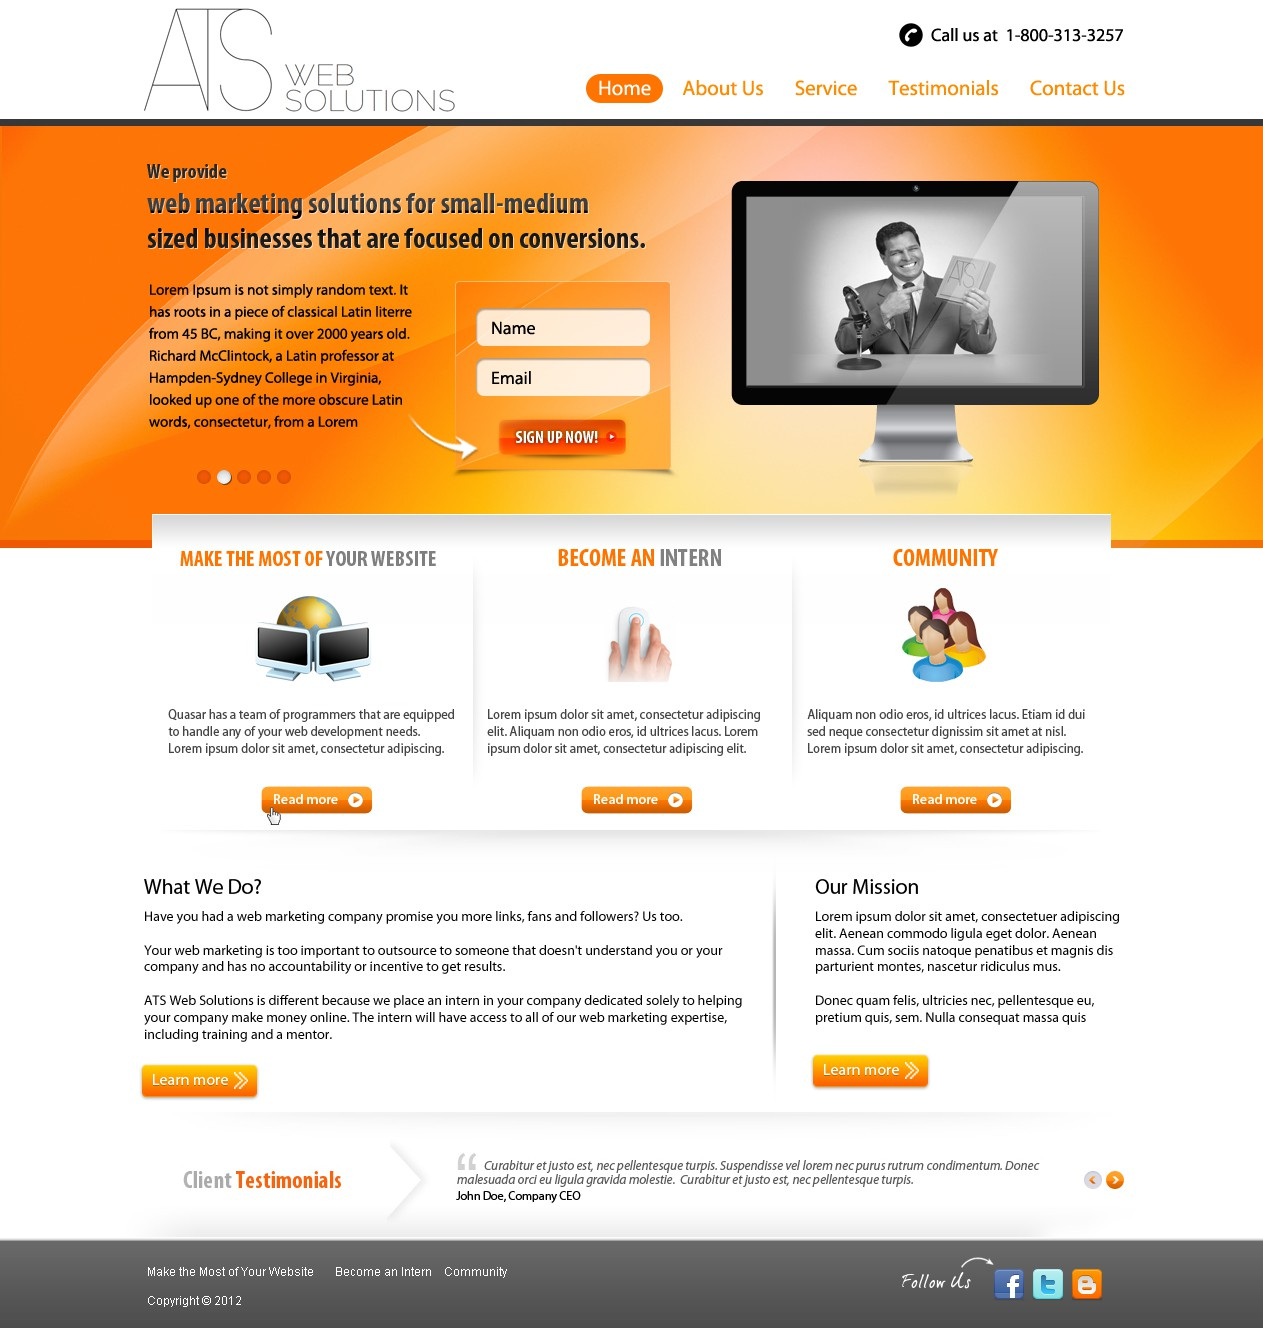 ATS Web Solutions needs a new website design